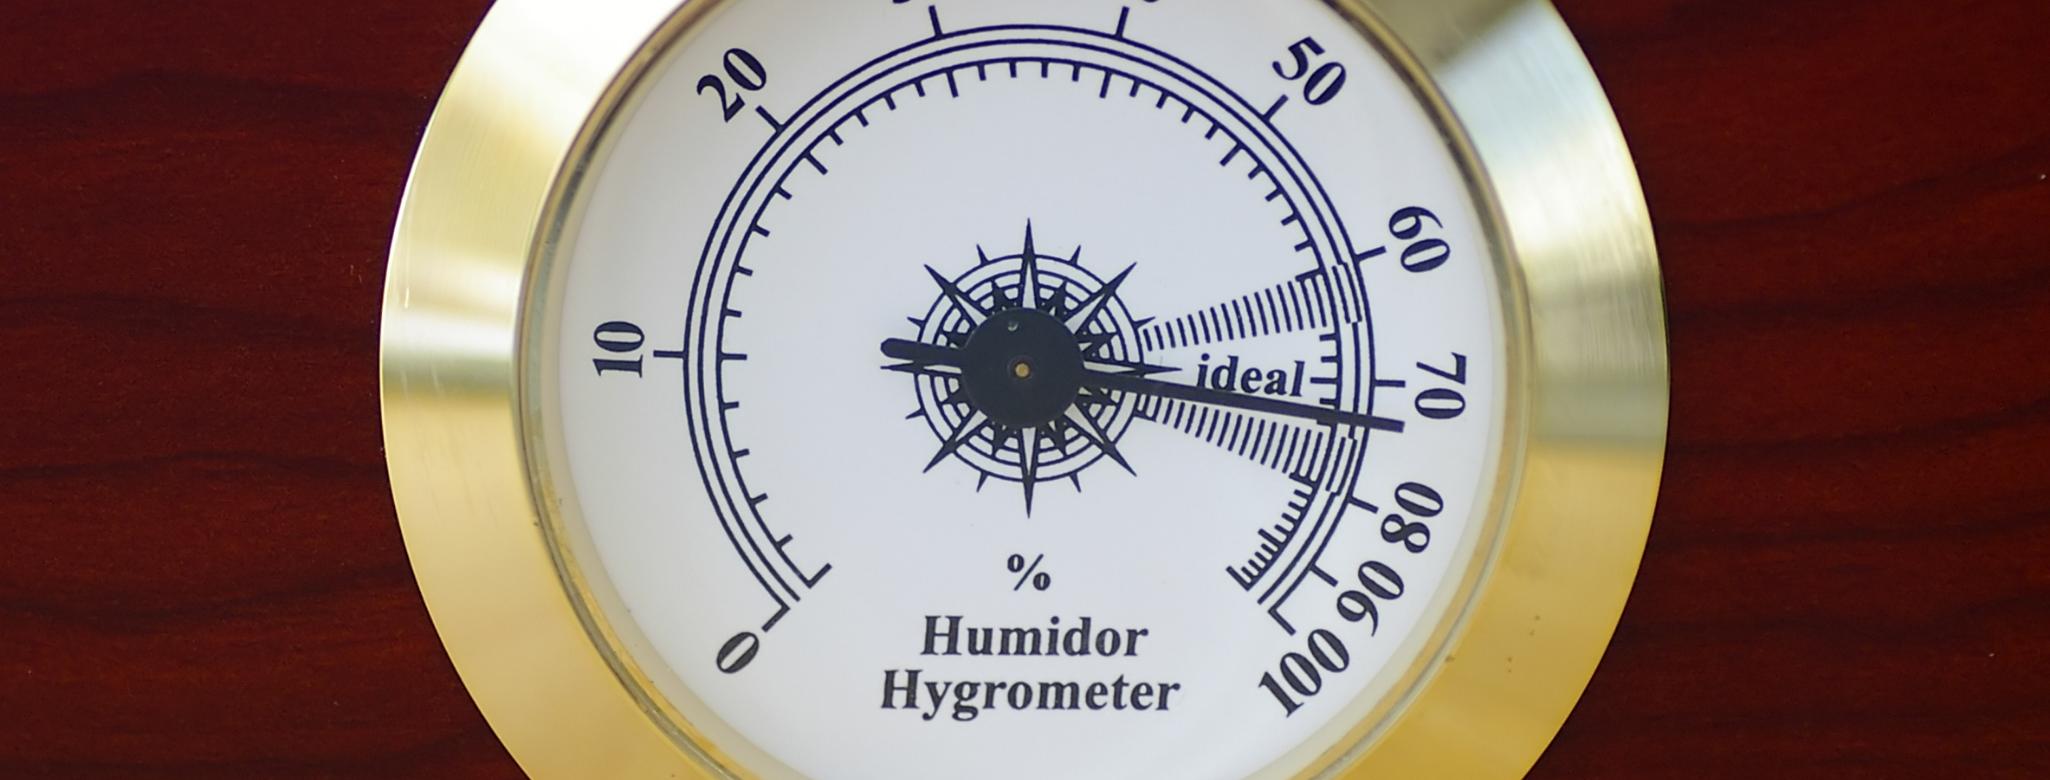 a humidor hygrometer